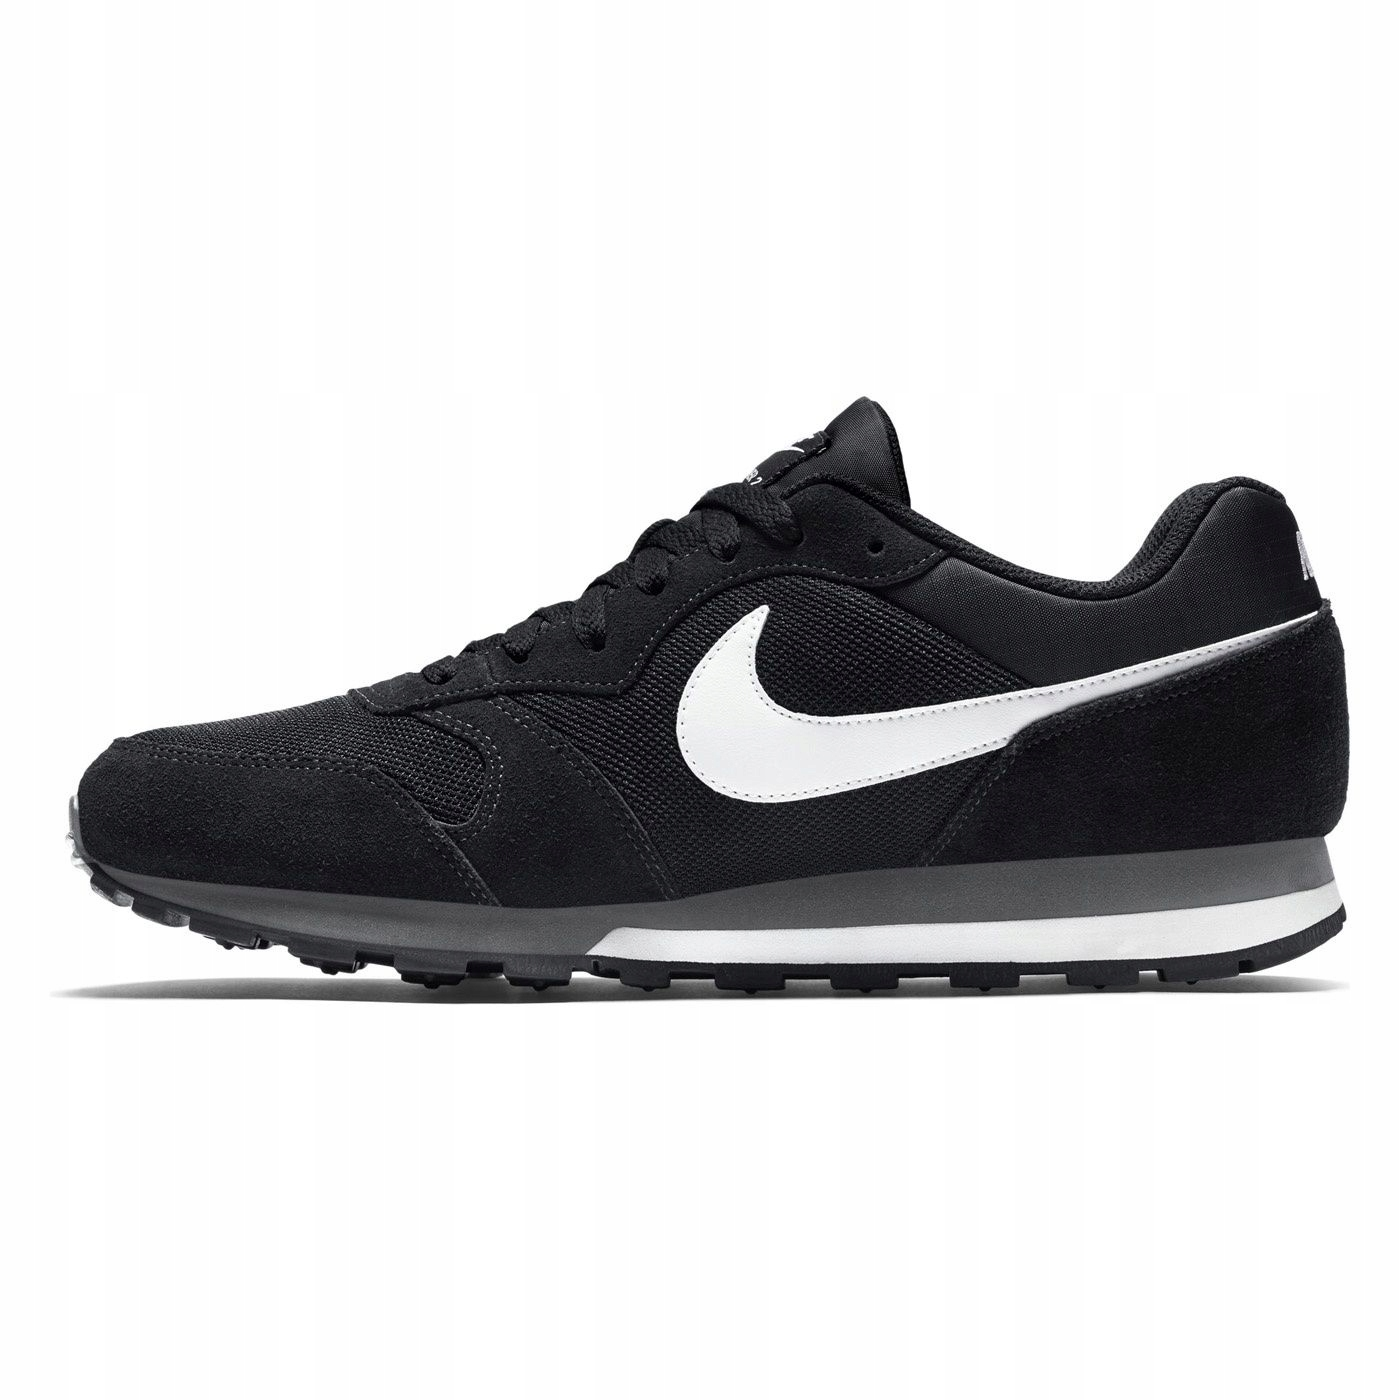 Интернет Магазин Спортивной Обуви Nike